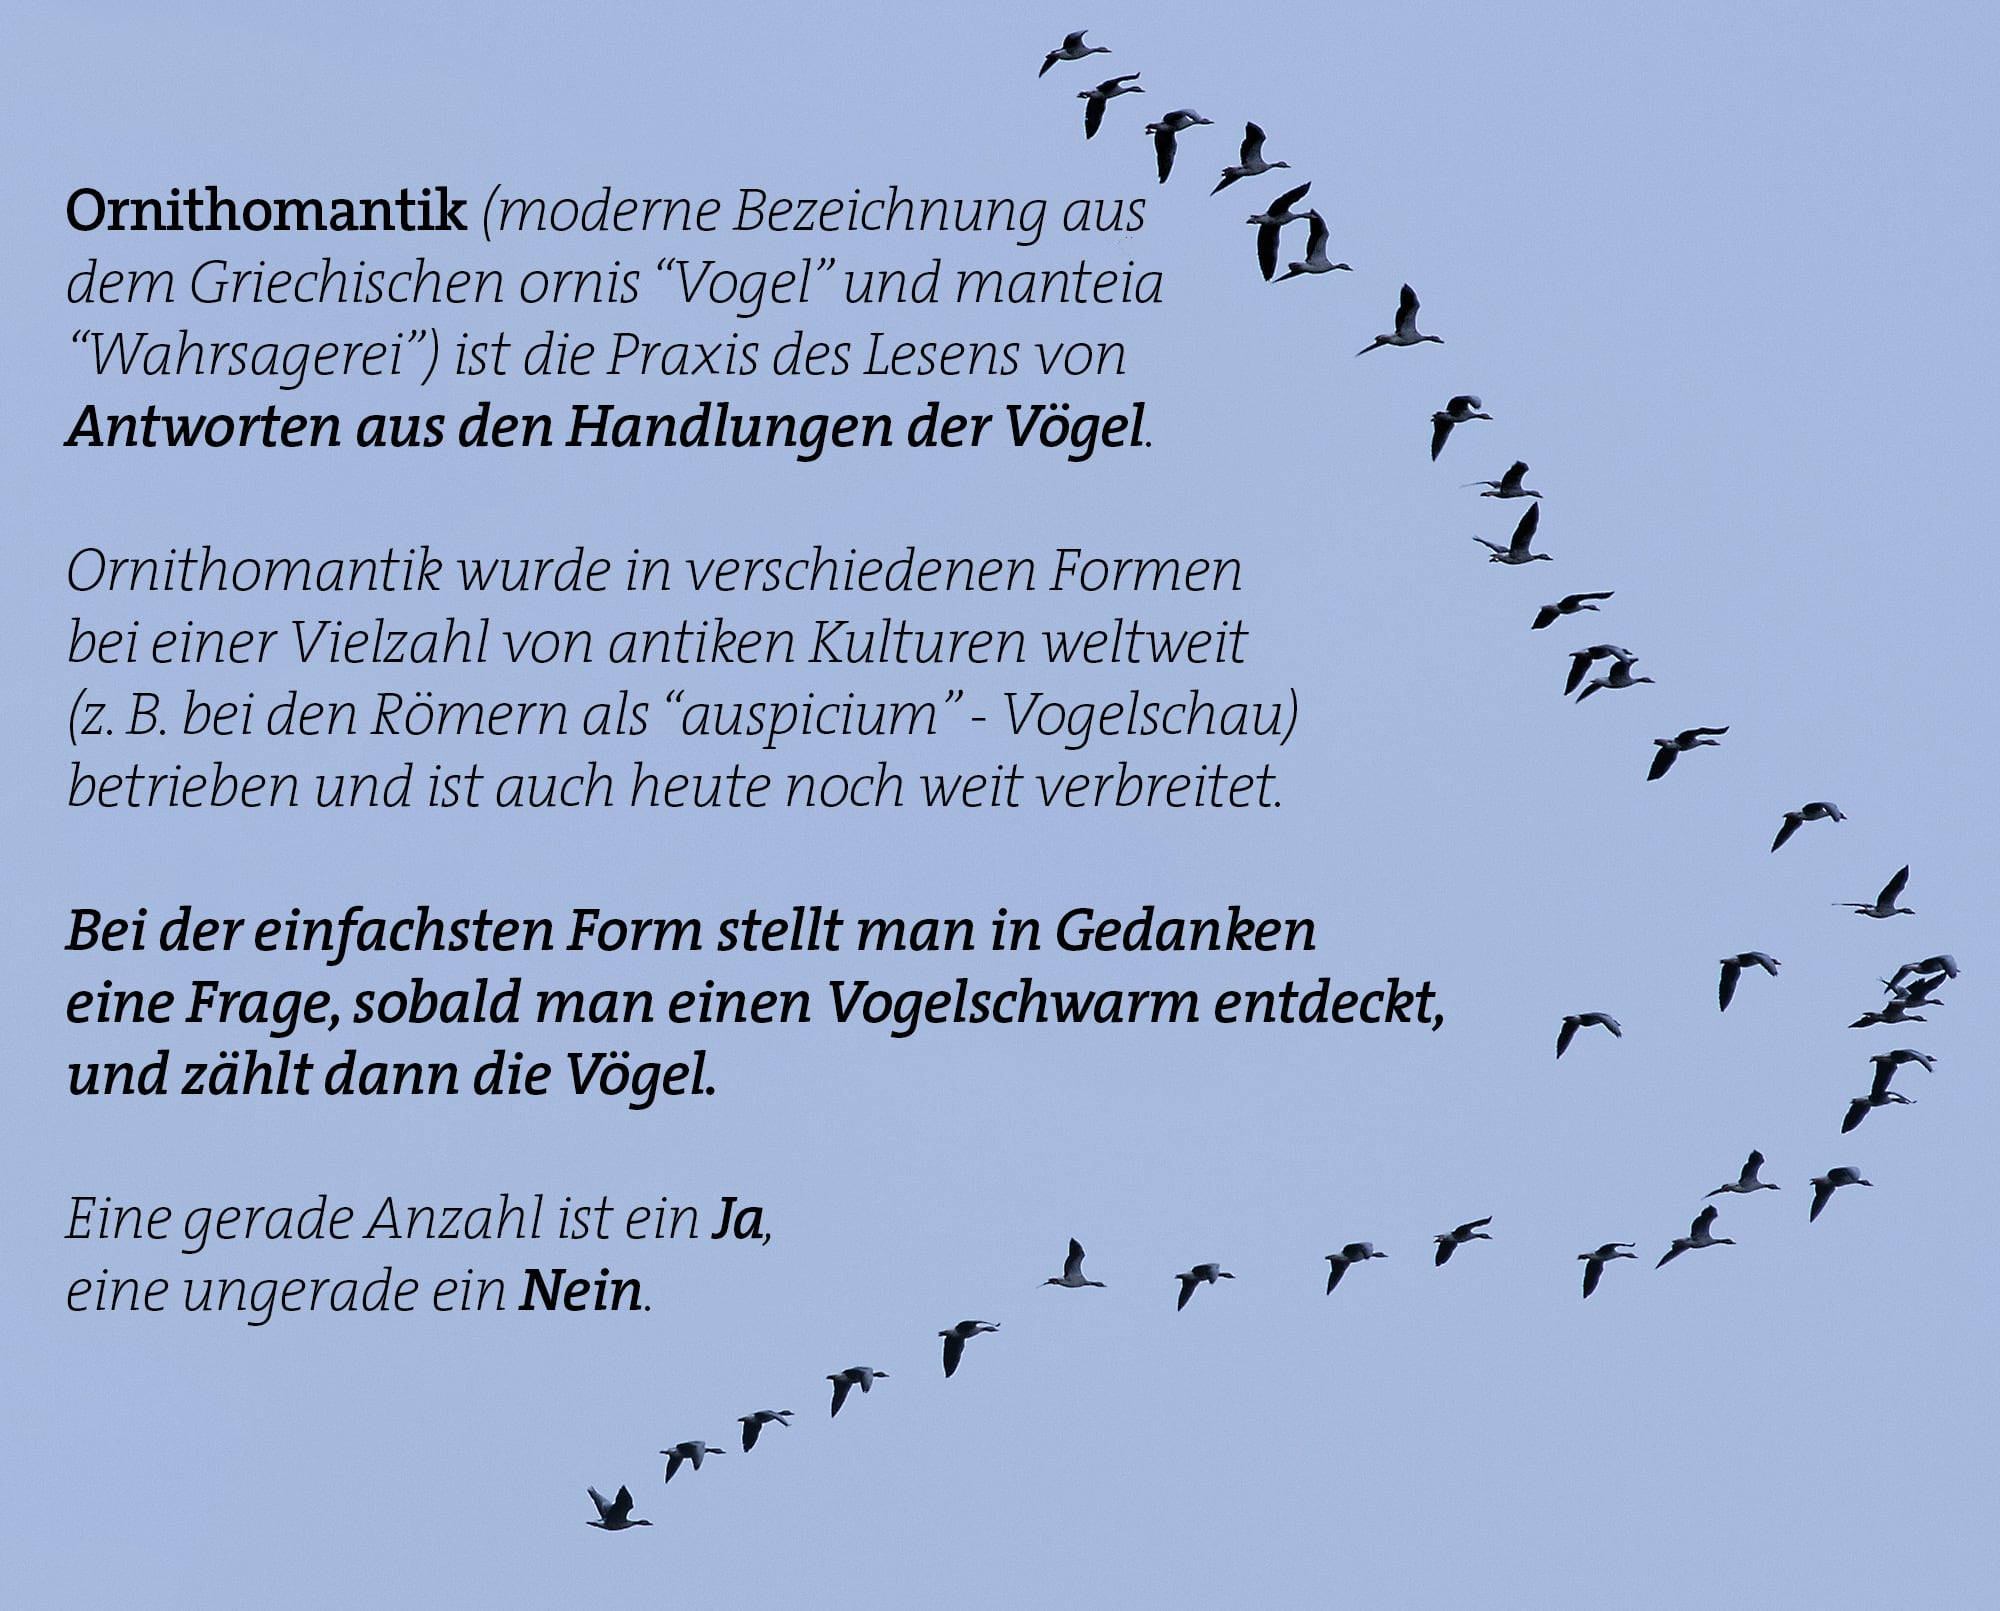 Ornithomantik - Wahrsagen mit Vögeln